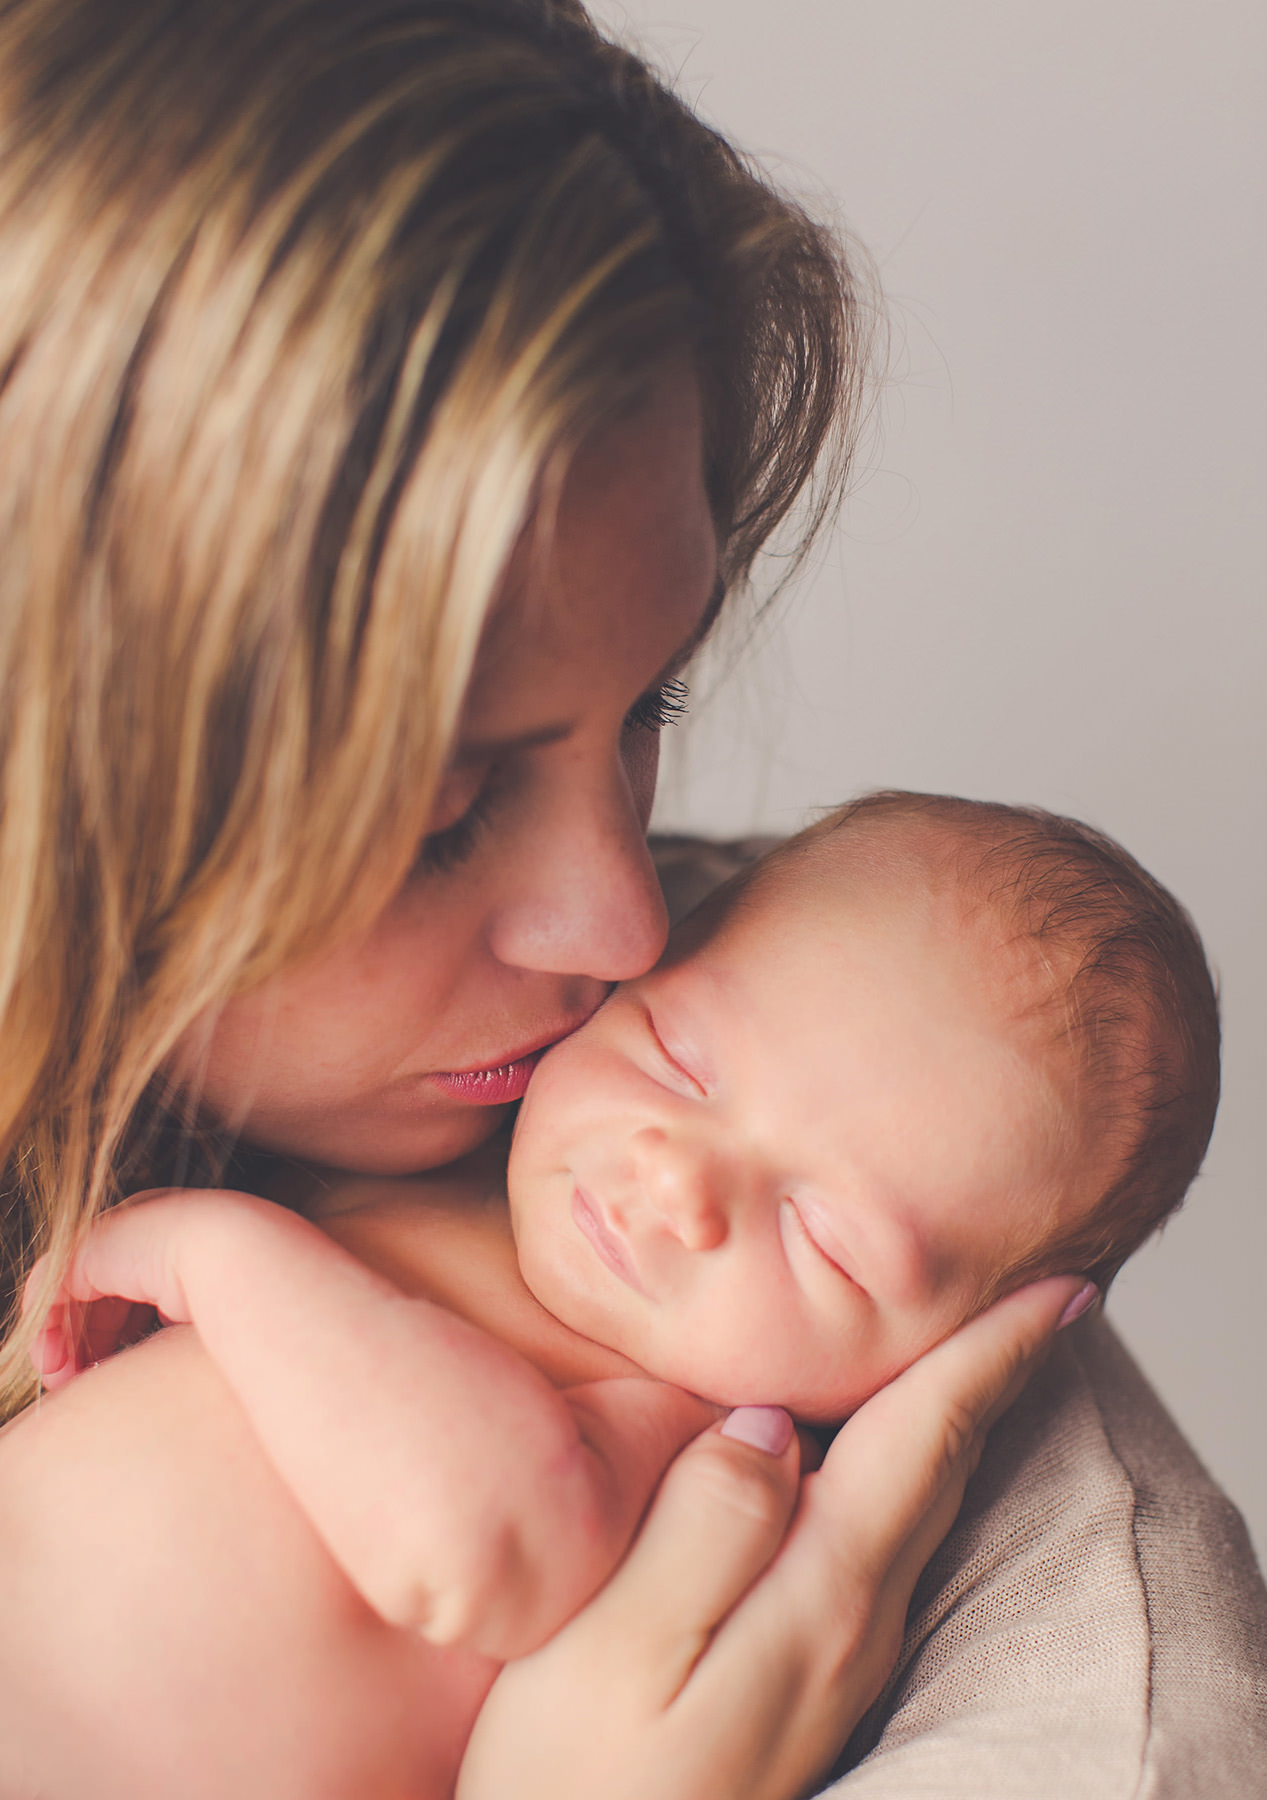 mom baby kiss